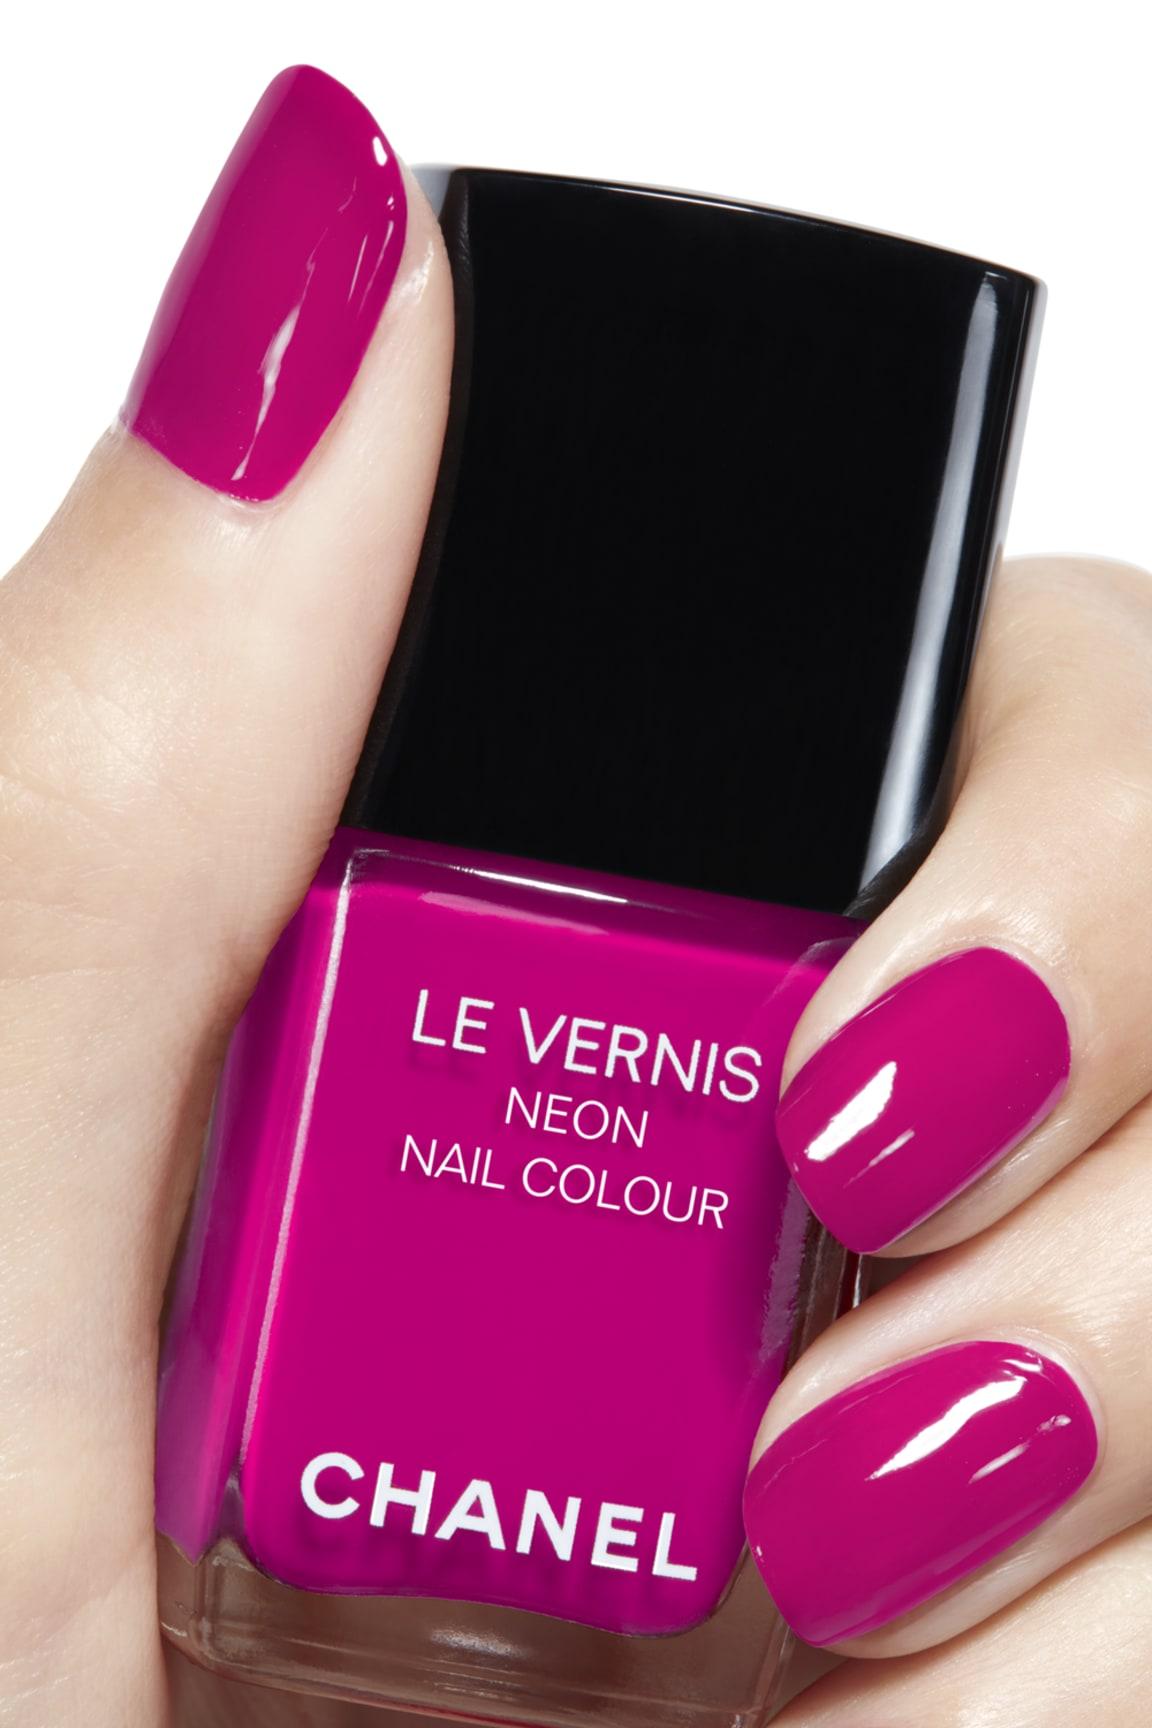 Application makeup visual 2 - LE VERNIS NEON NAIL COLOUR 648 - TECHNO BLOOM